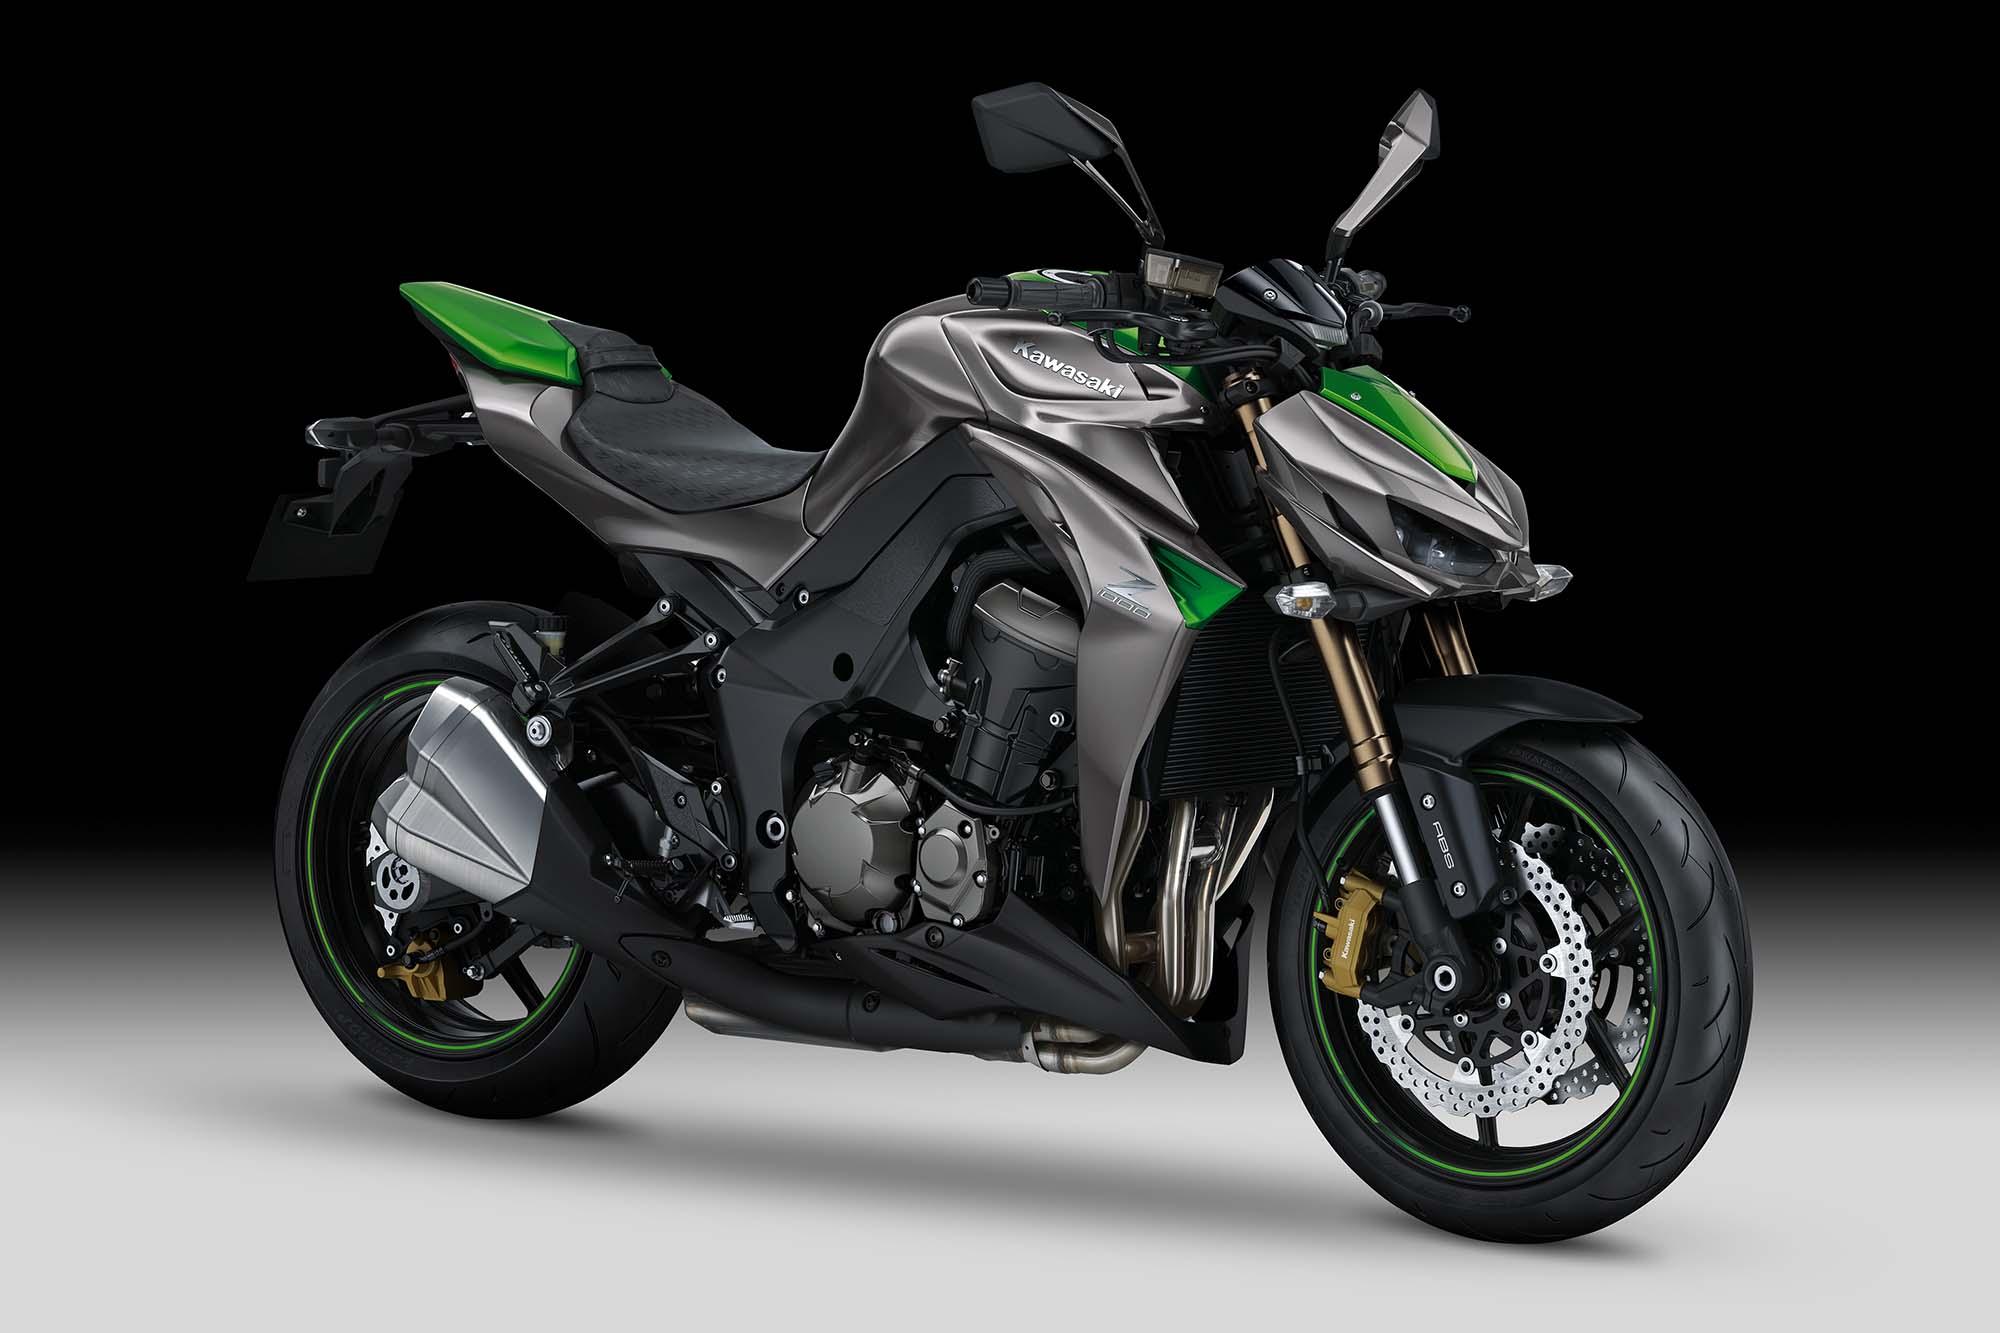 2014 Kawasaki Z1000 Sugomi Looks Edgy And Mean Autoevolution